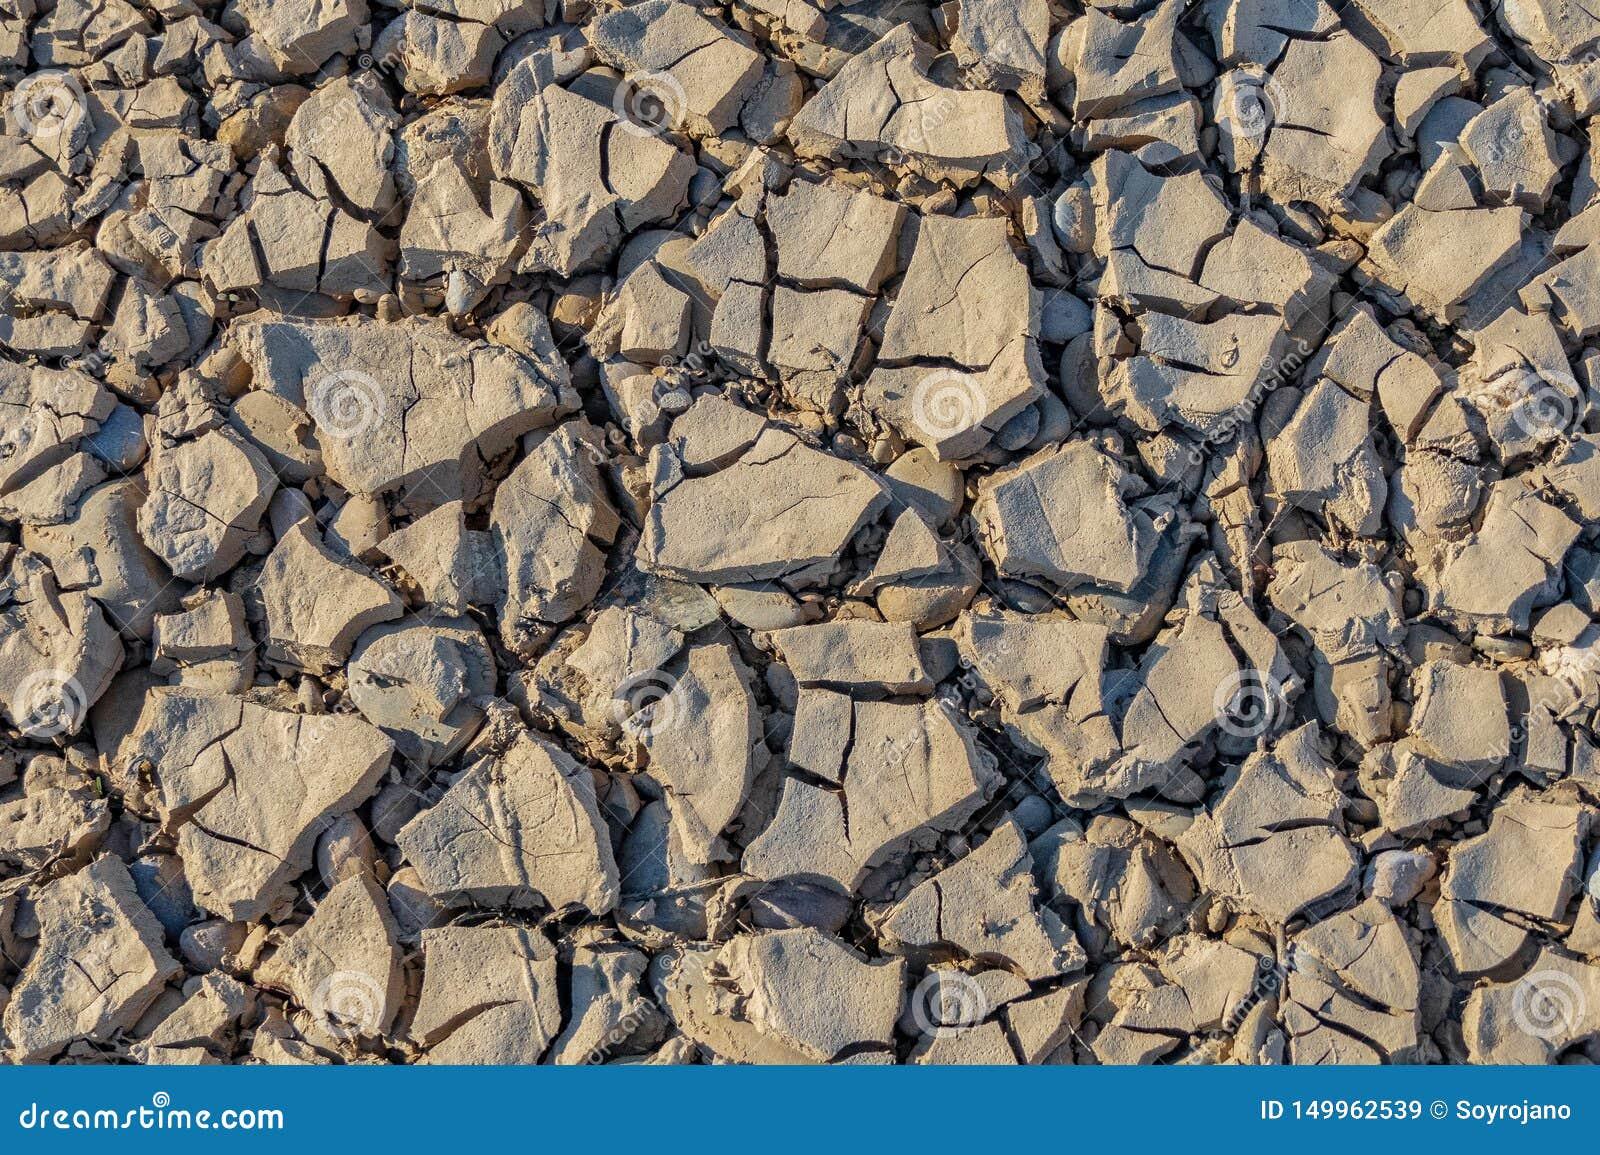 Dry earth texture light grey